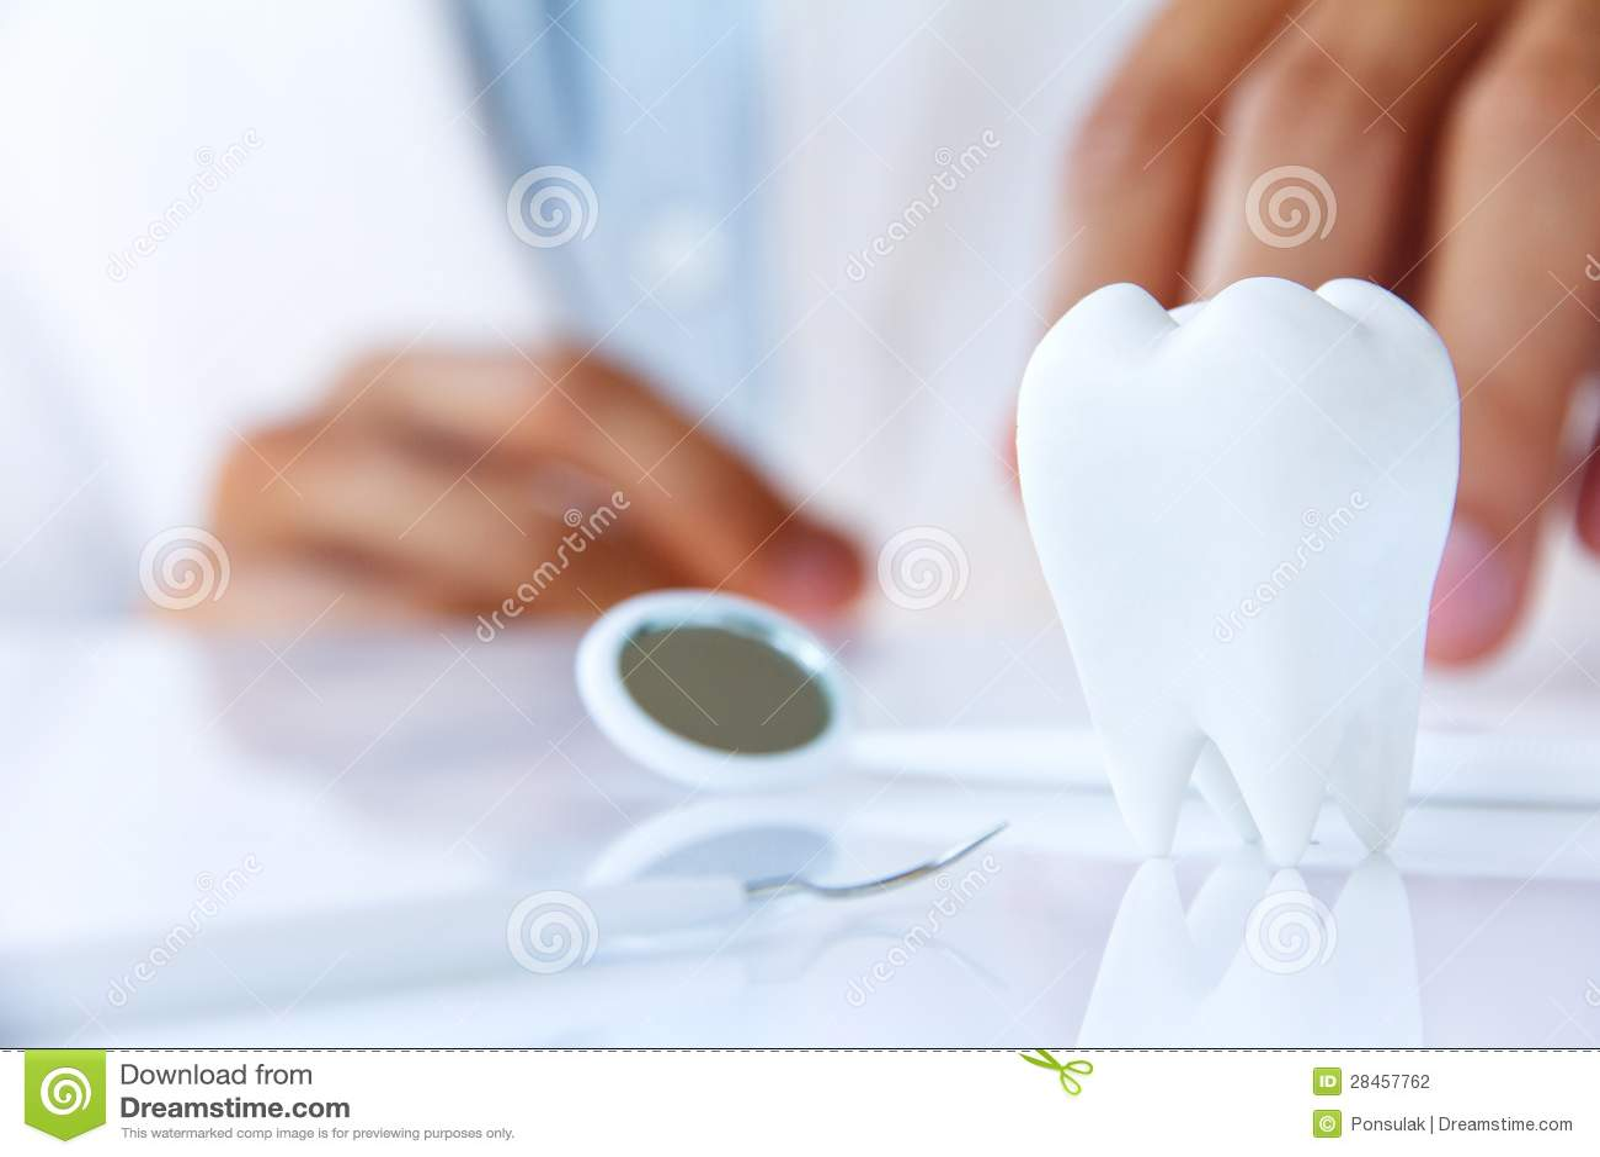 Molaire, concept dentaire